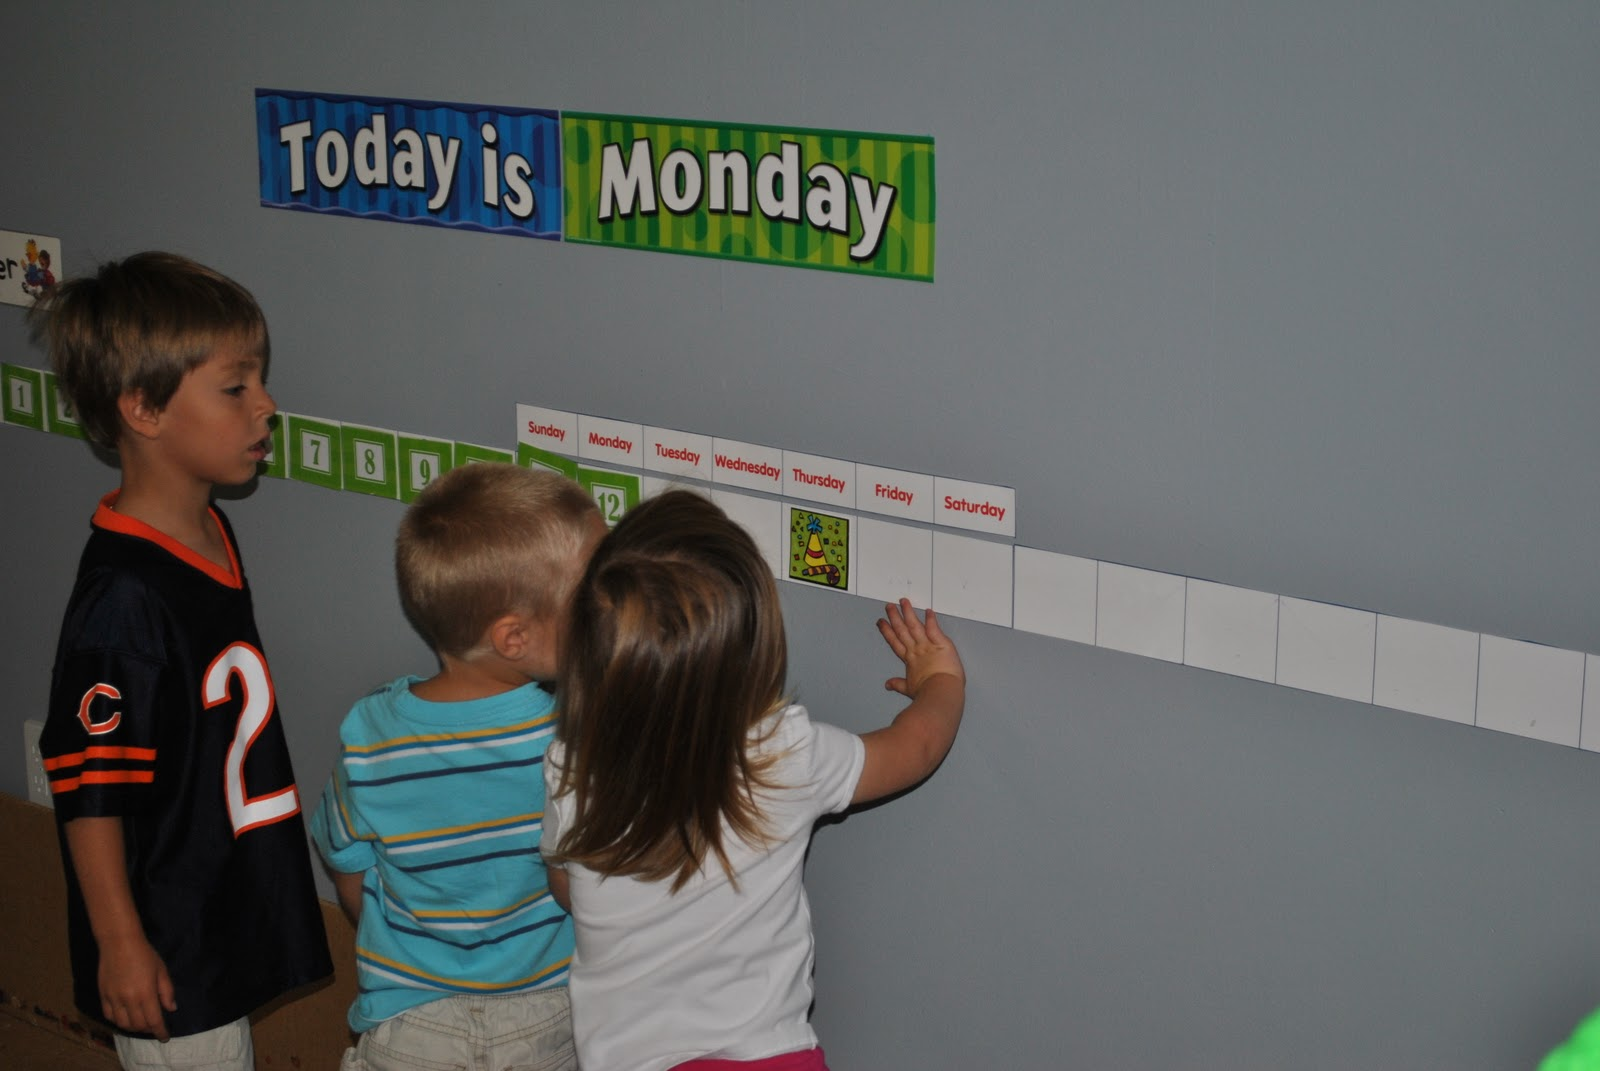 Linear Calendar In Kindergarten : Play counts the deconstructed calendar